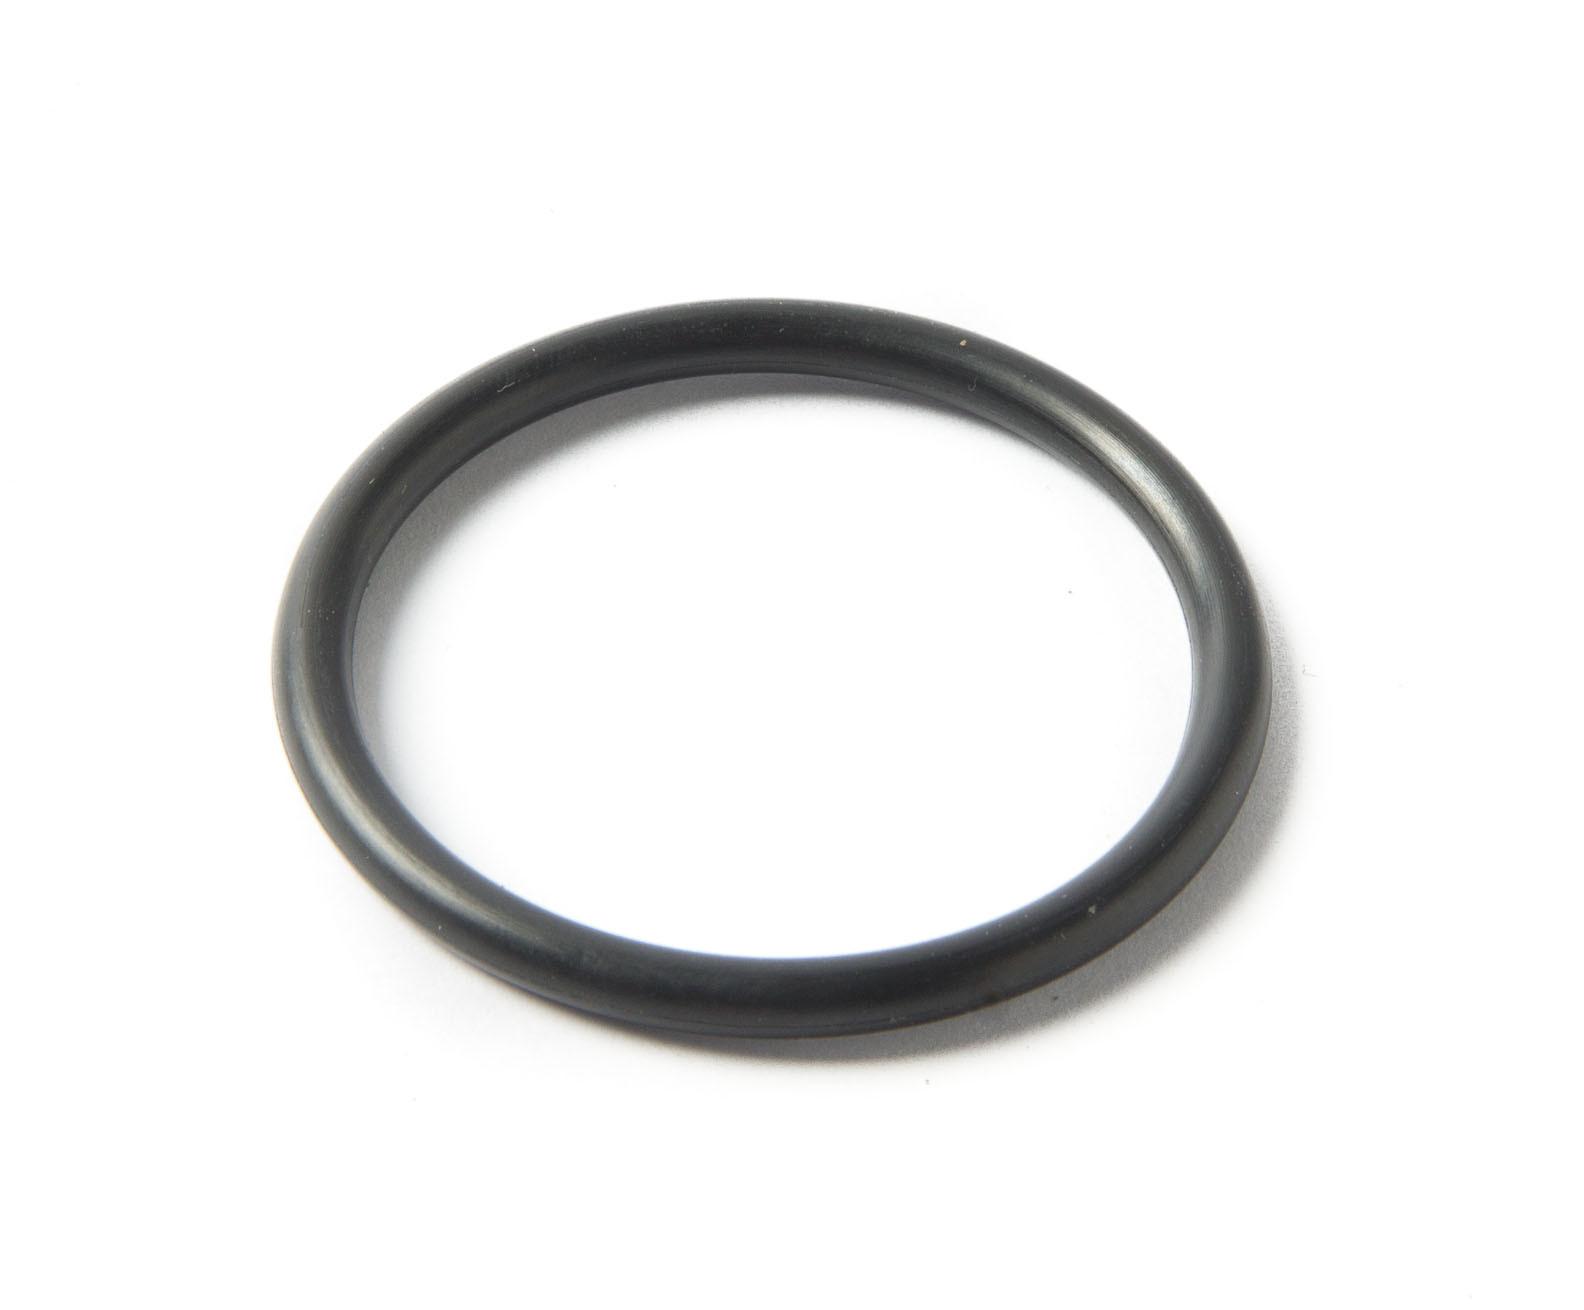 'O' ring